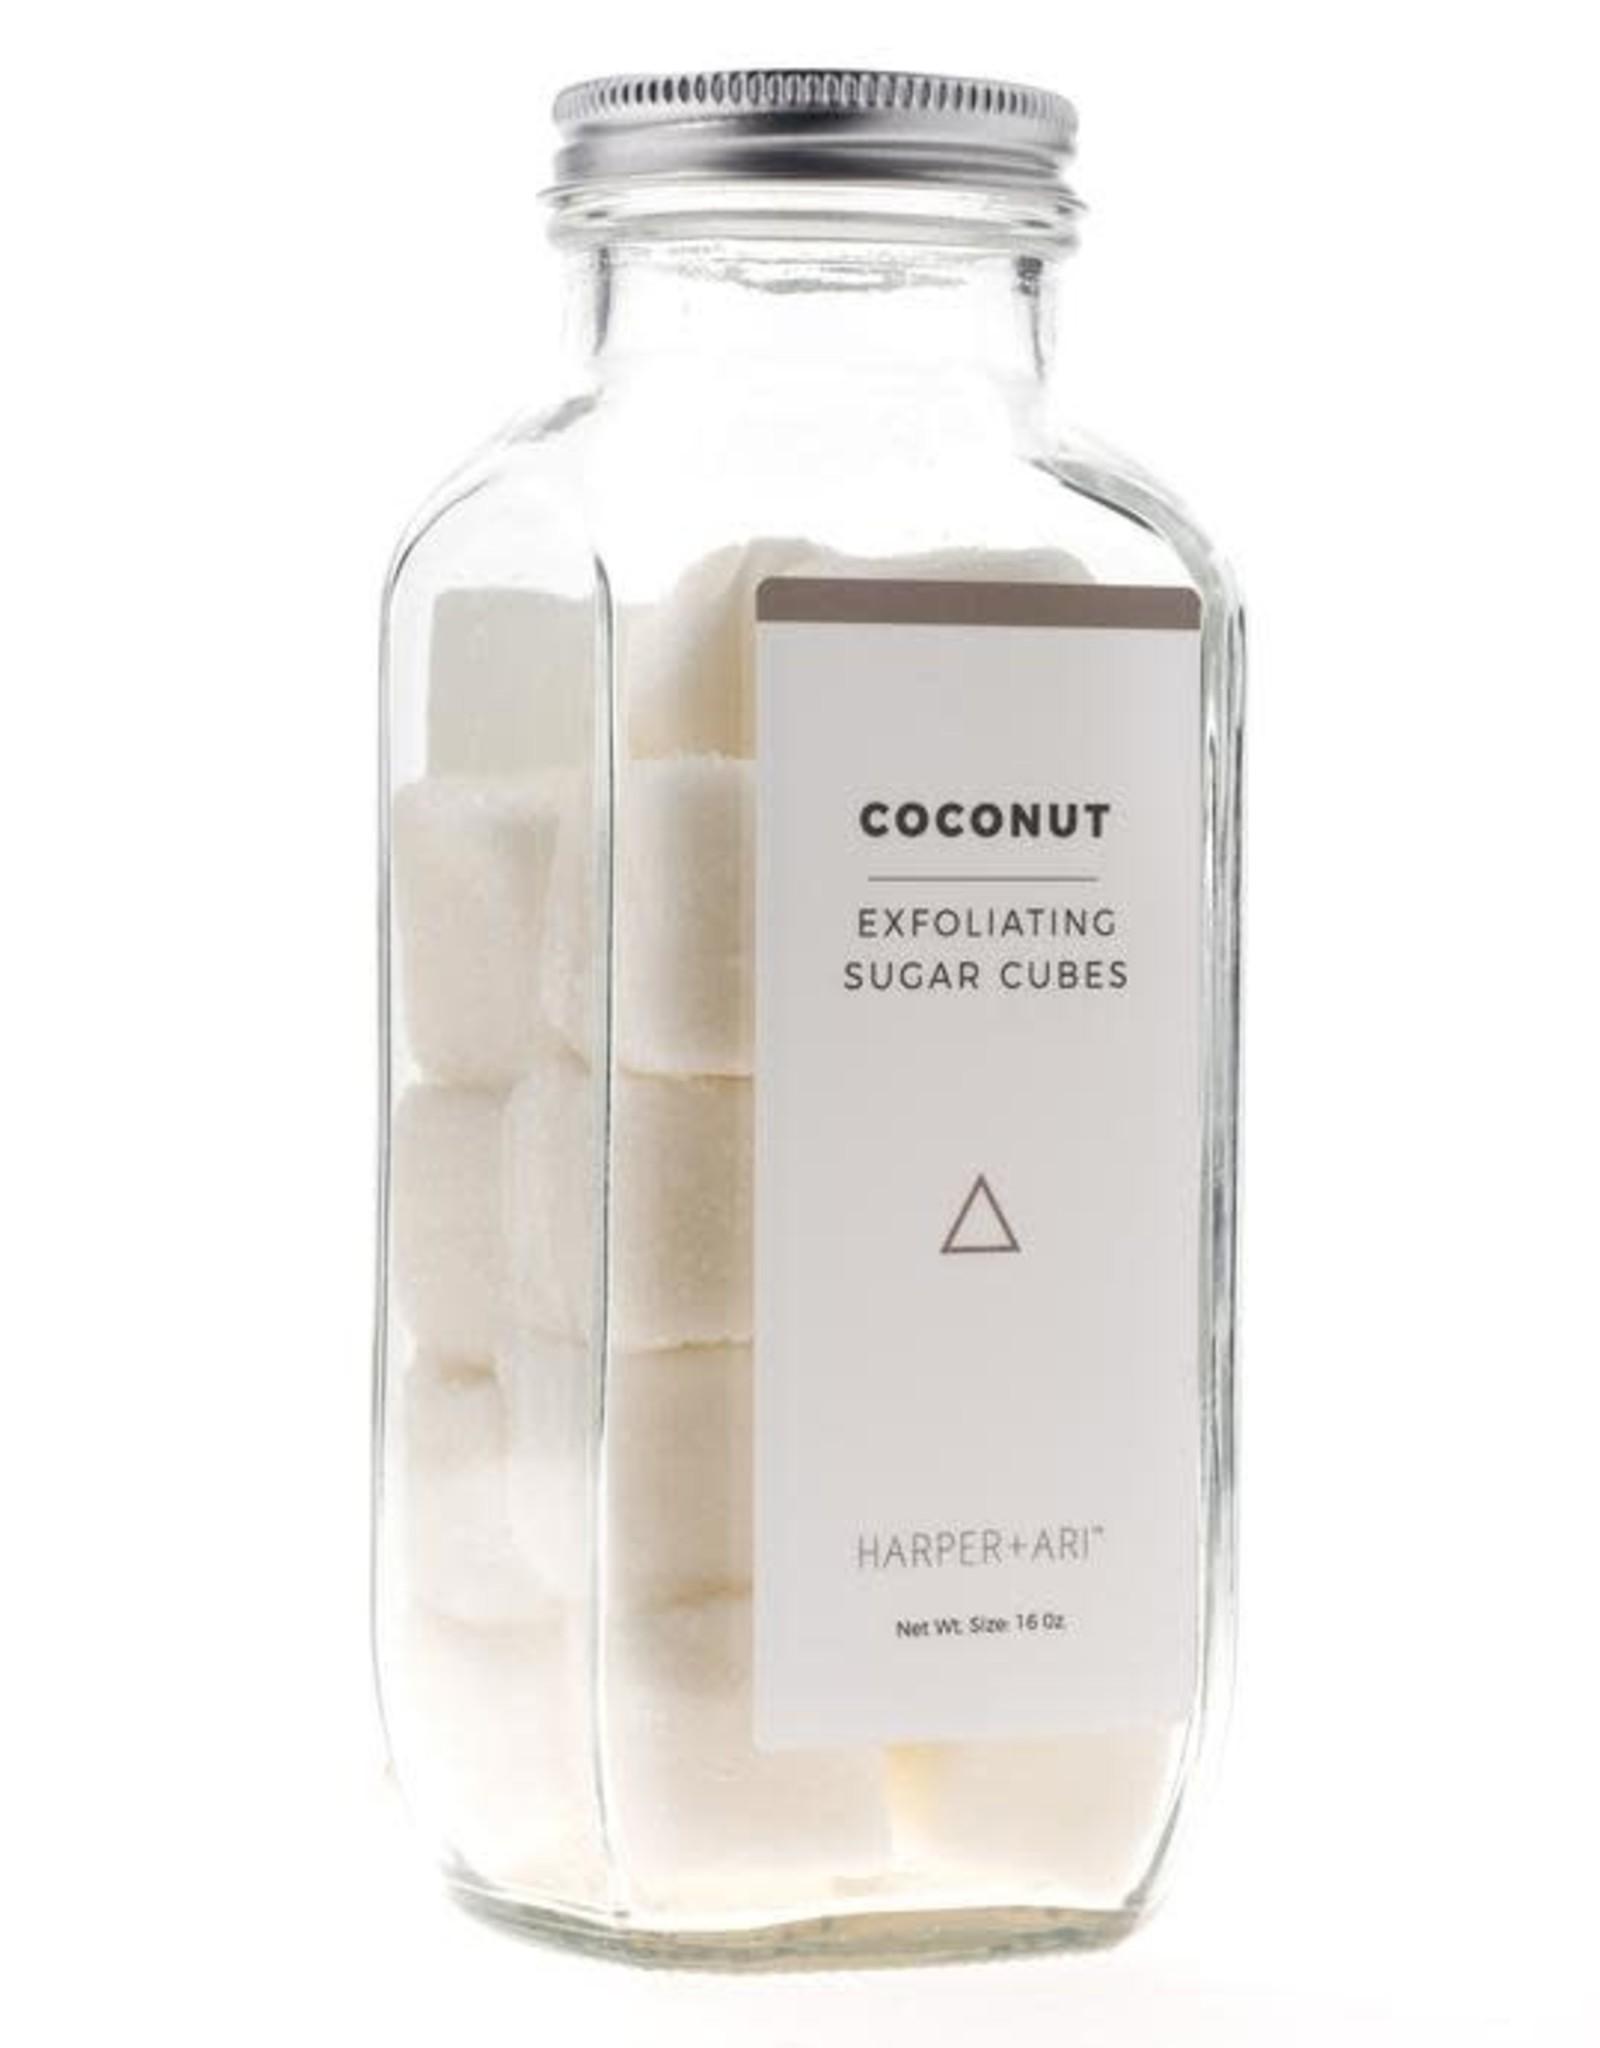 Exfoliating Sugar Cubes 16oz Bottle Coconut